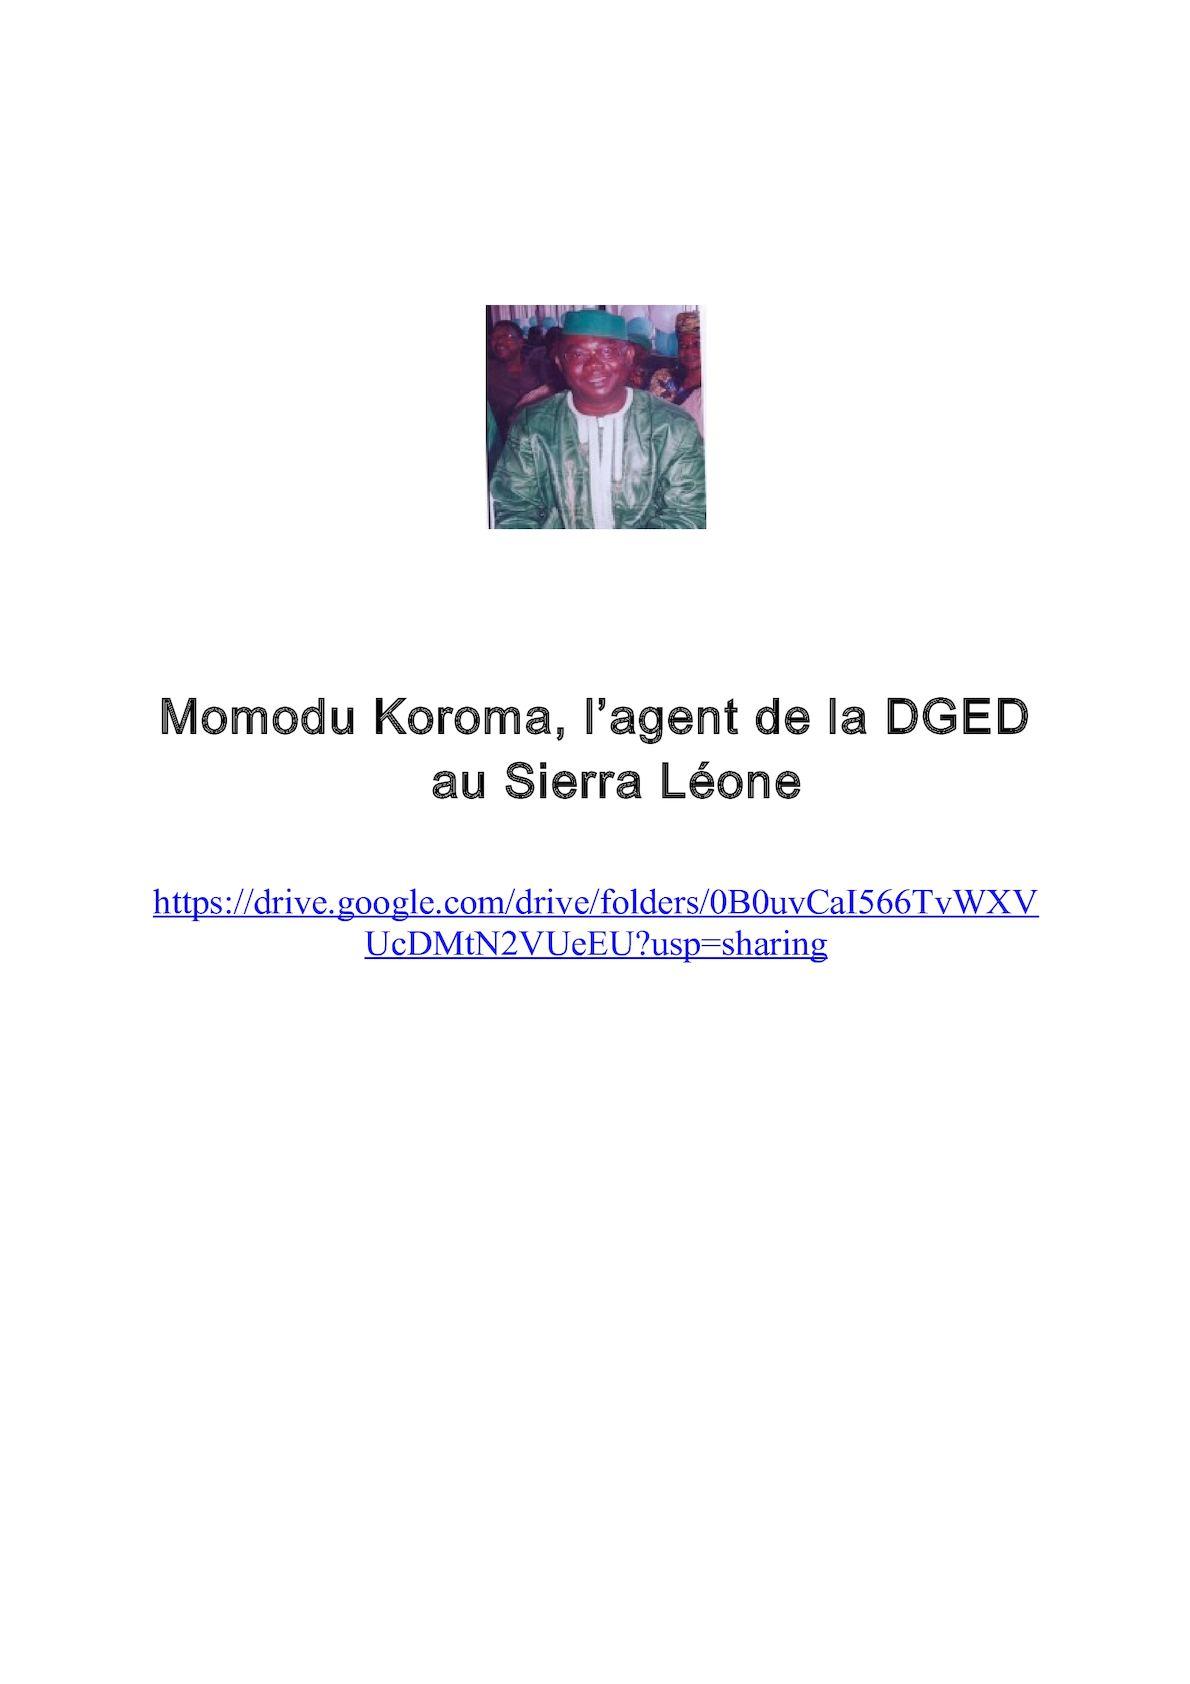 Momodu Koroma